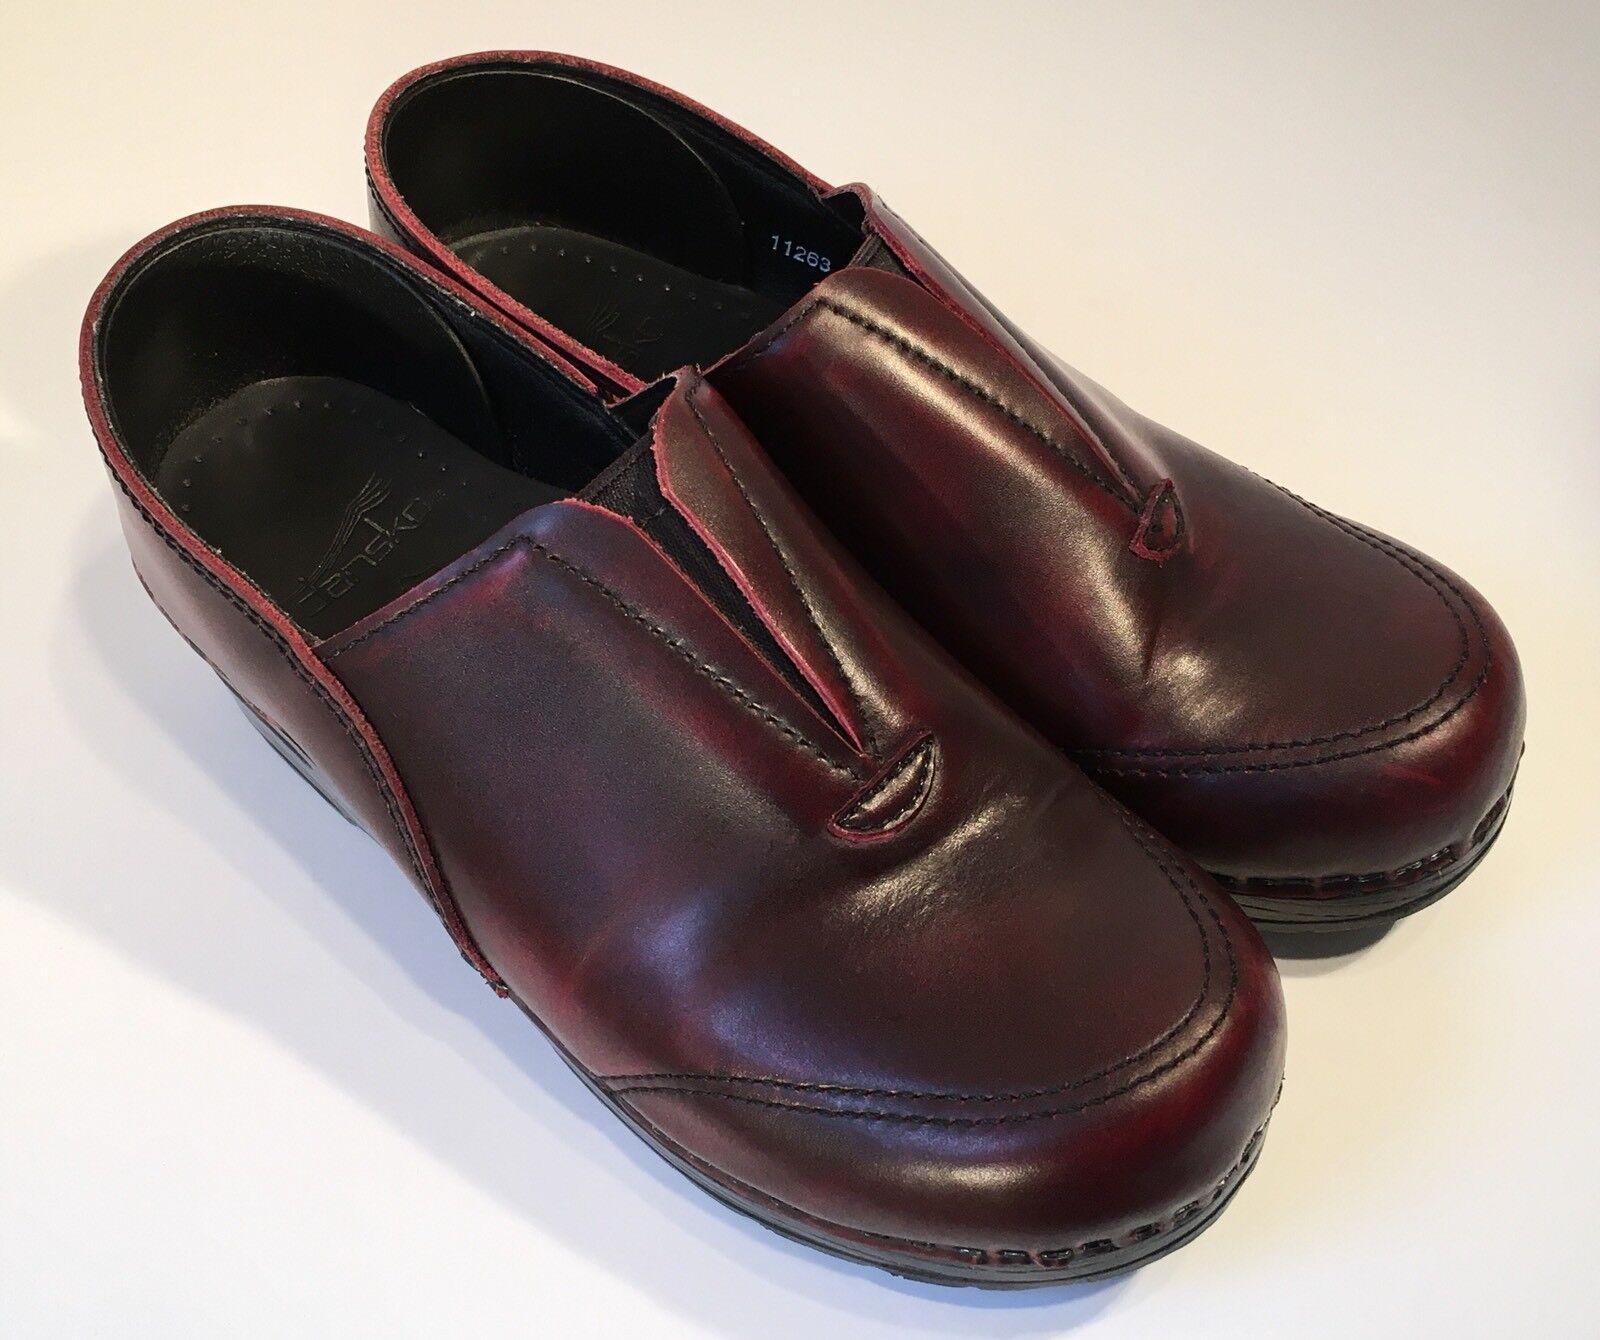 Dansko Professional Stapled Cordovan Leather Clogs Womens 38 - UNIQUE